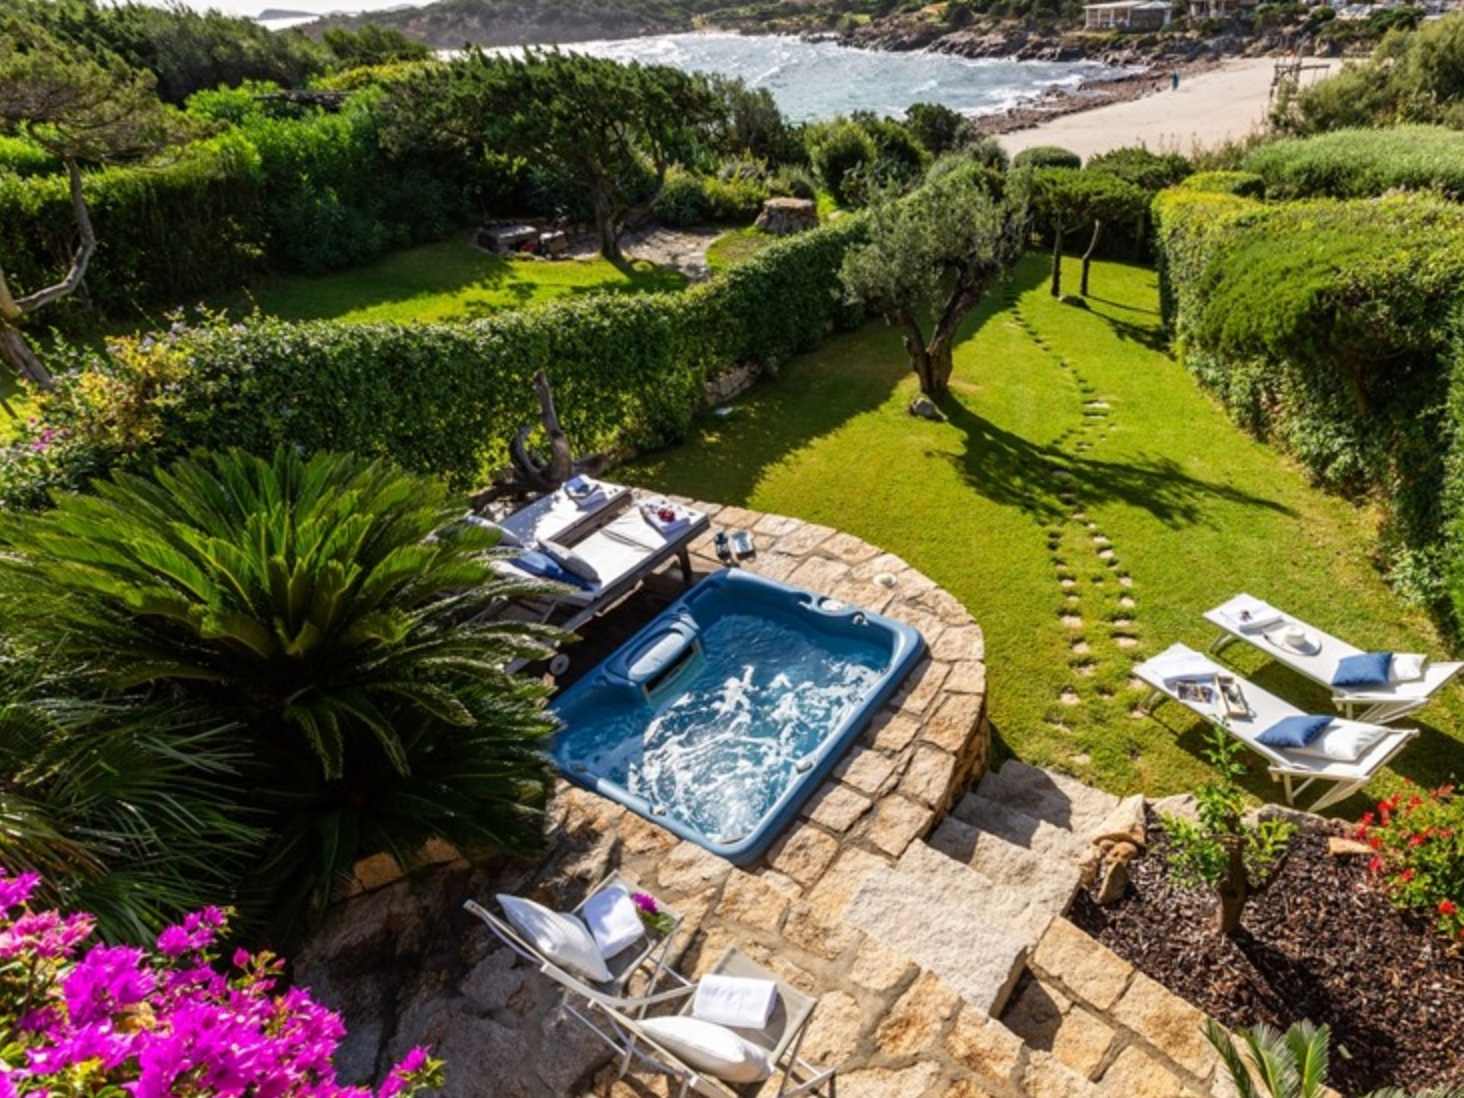 BEACHSIDE VILLA - COSTA SMERALDA - 3 BEDROOMS - 3 BATHWEEKLY PRICE FROM €4,250